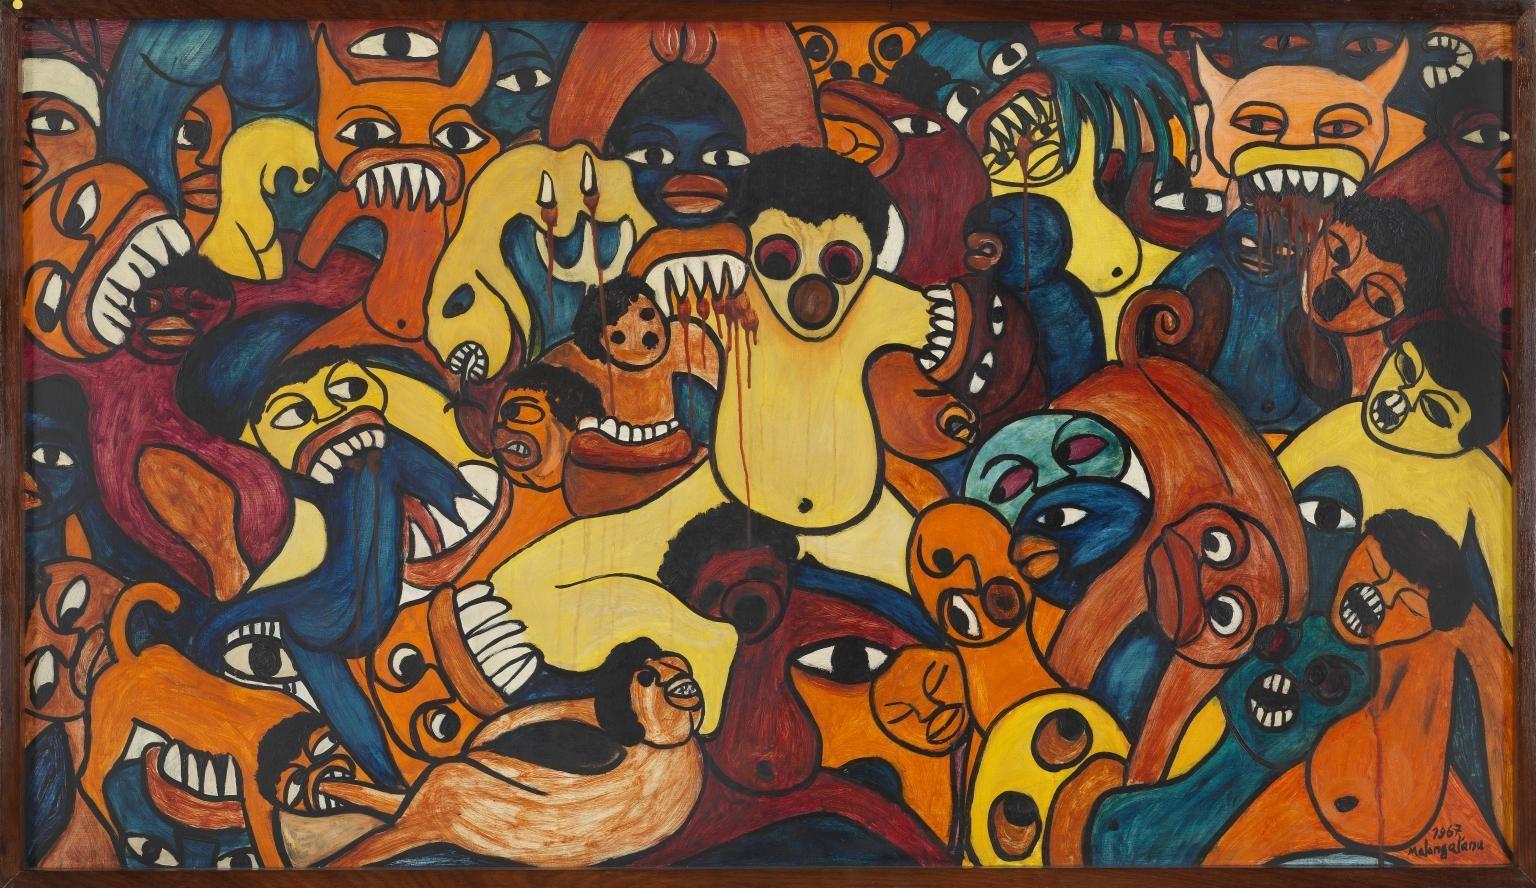 Surrealism Beyond Borders   Malangatana featured in exhibit at The Met, New York